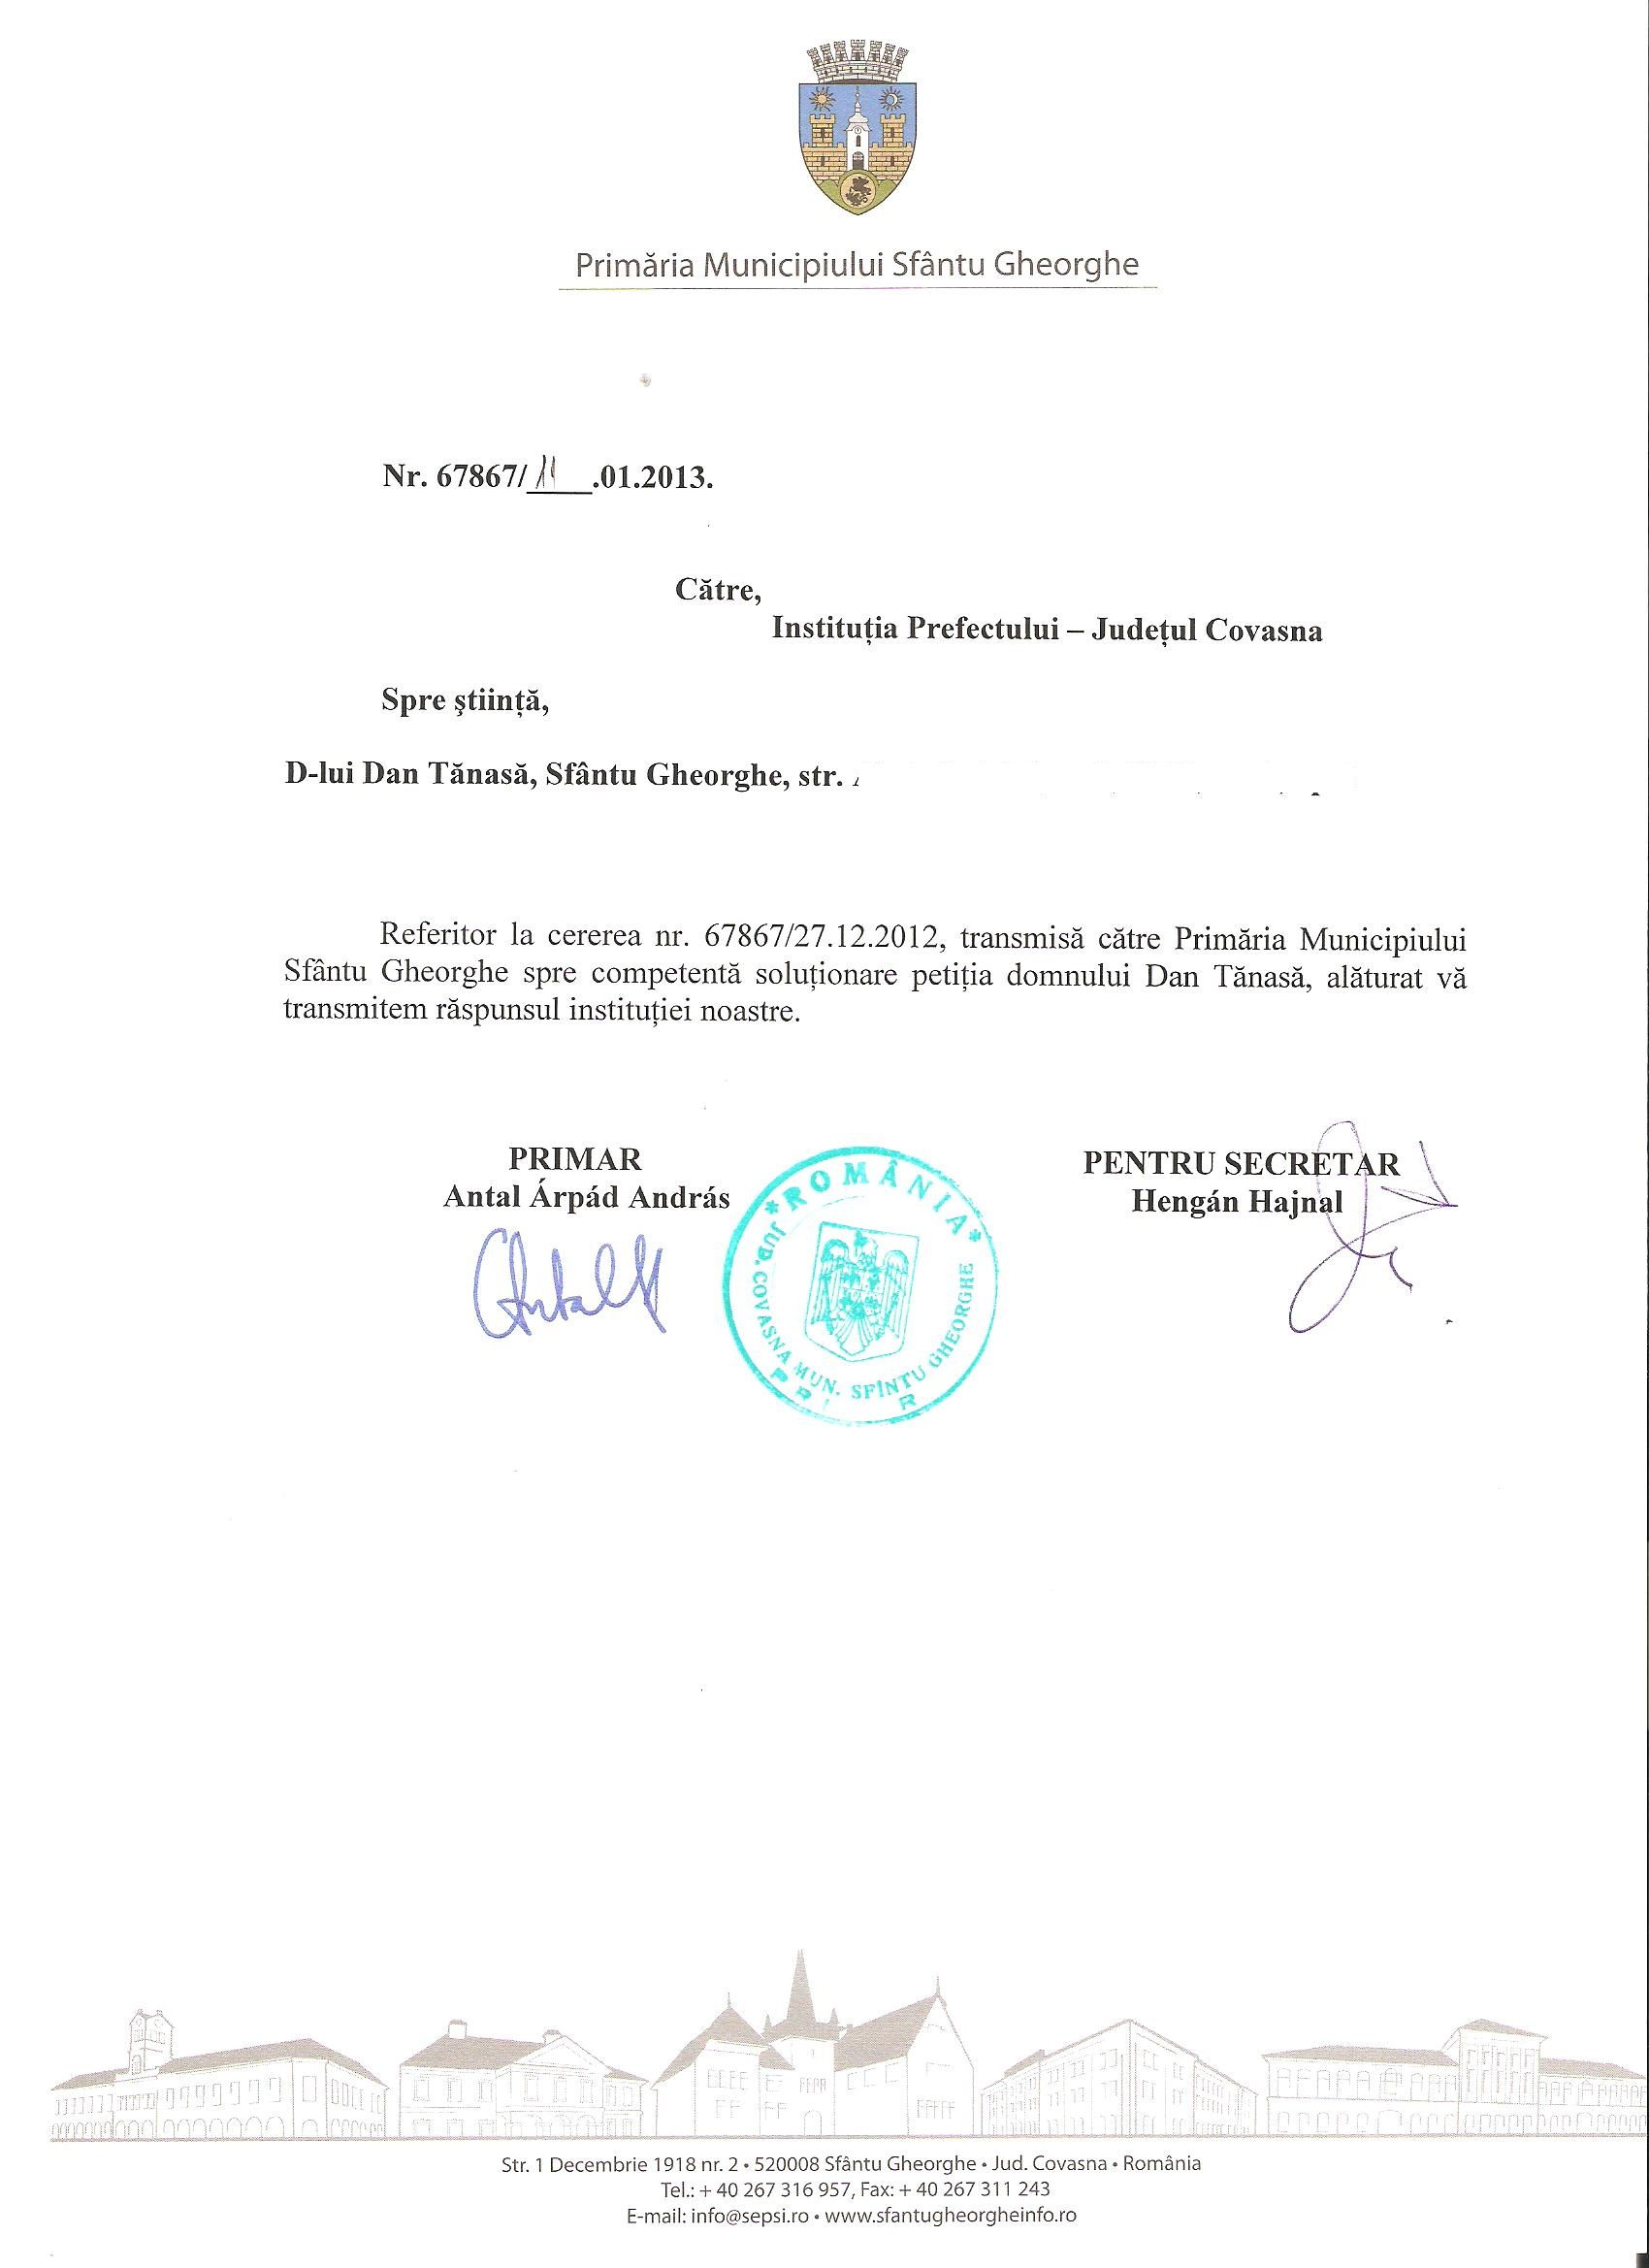 Primăria Sfântu Gheorghe SC Producție Prod AX SRL fonduri europene